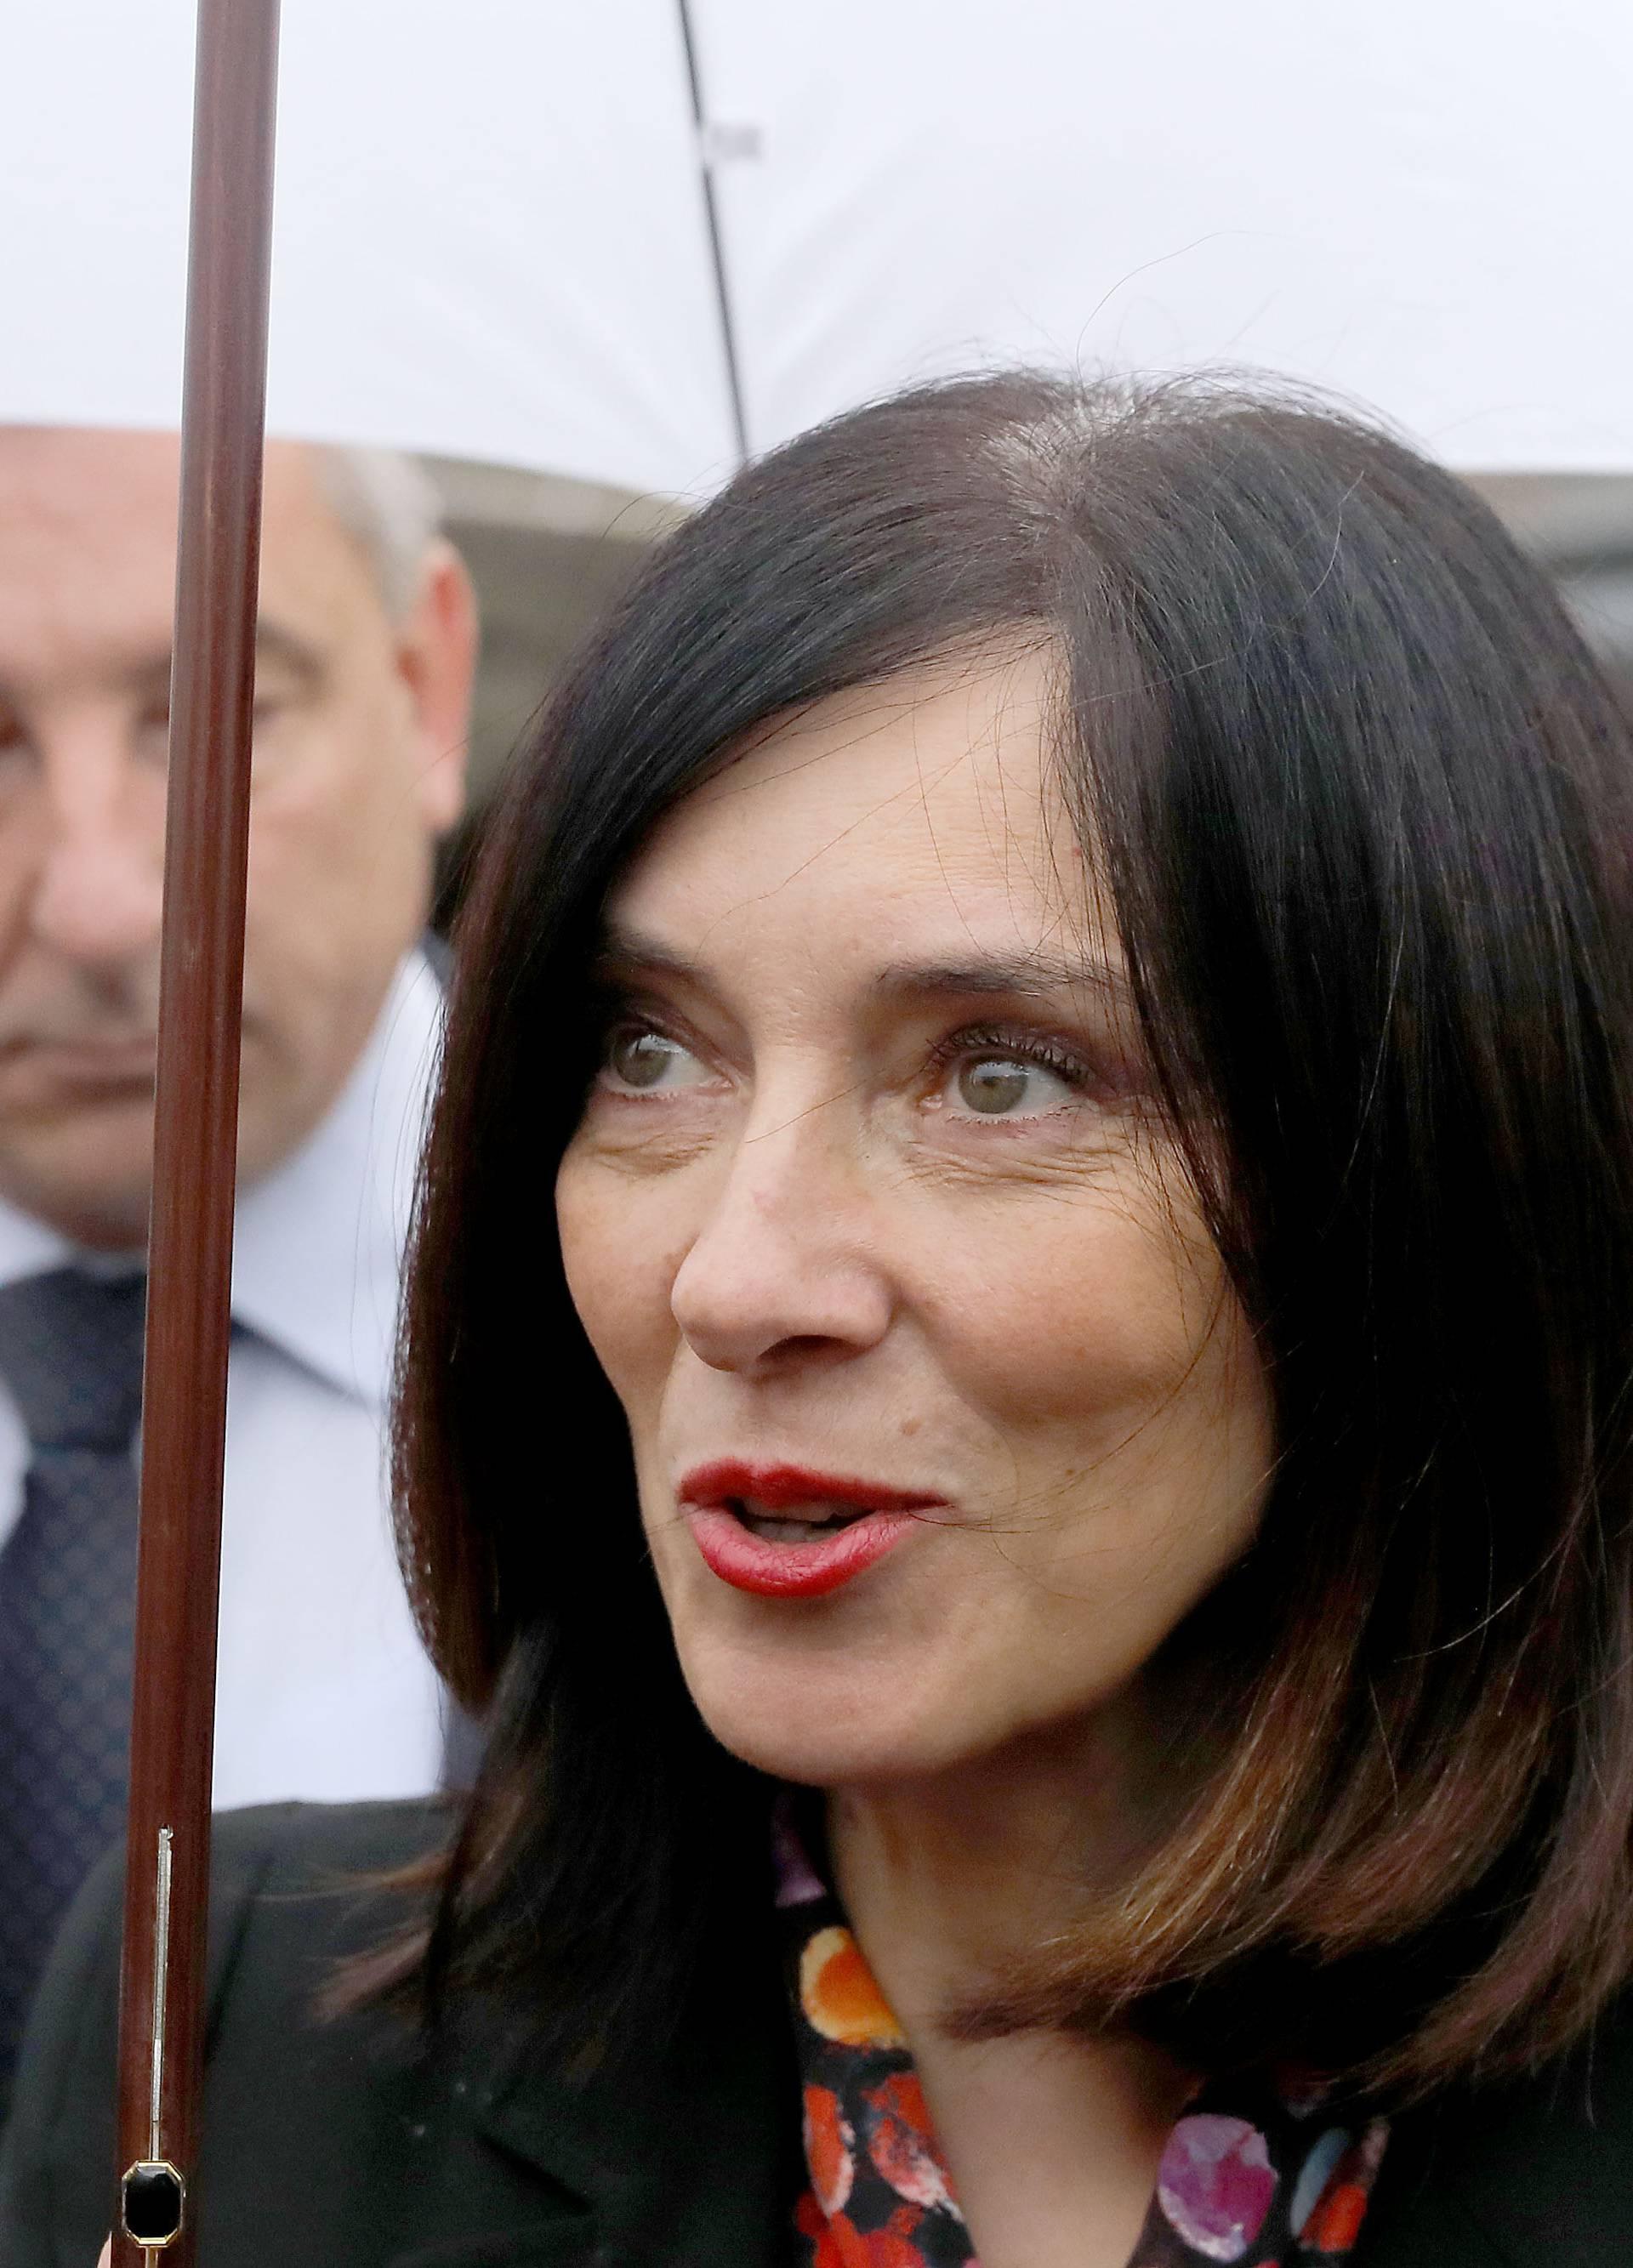 Zagreb: Ministrica Divjak komentirala štrajk učitelja i profesora